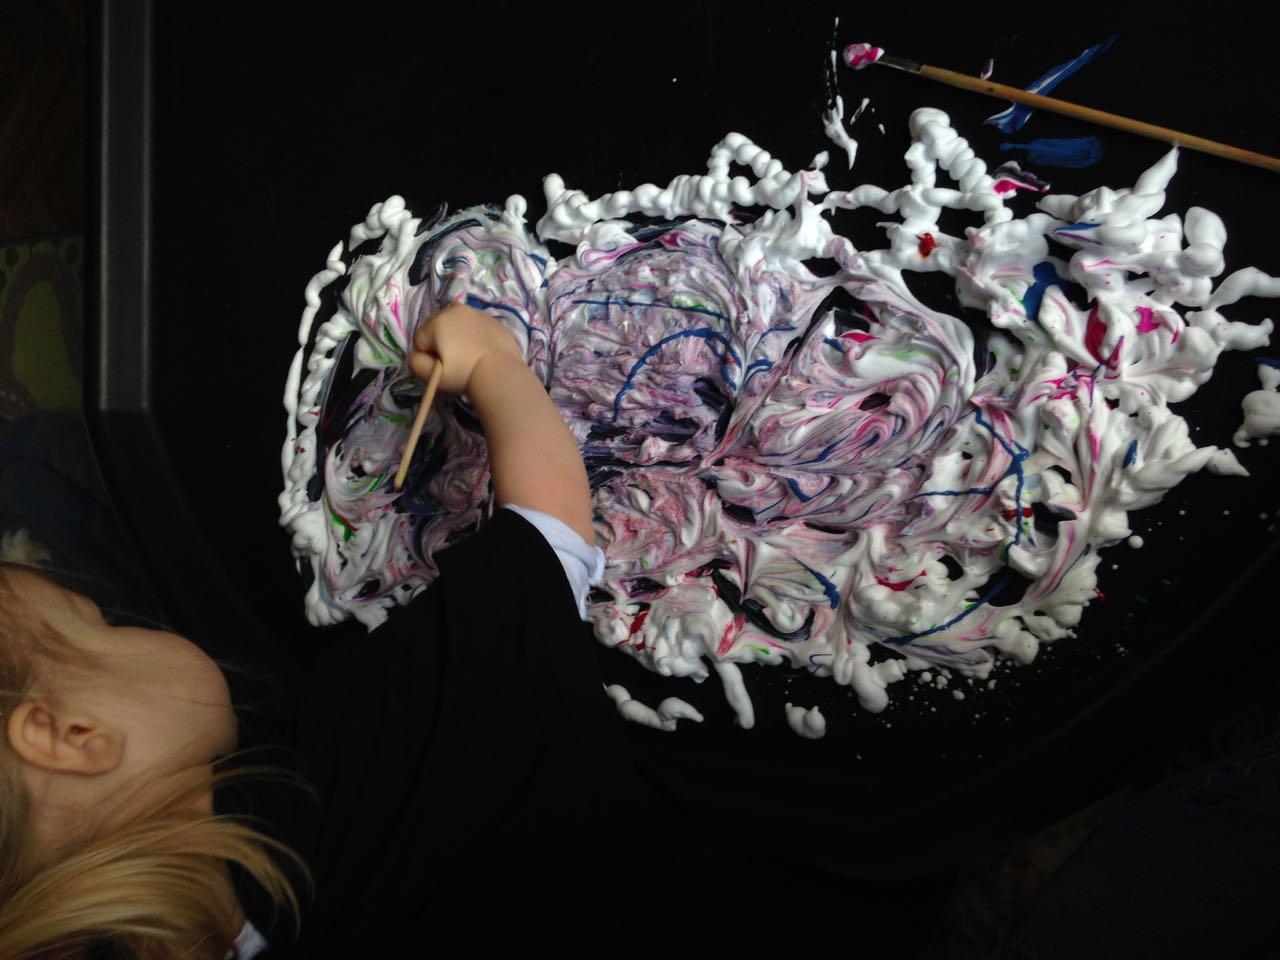 shaving foam marble - 4